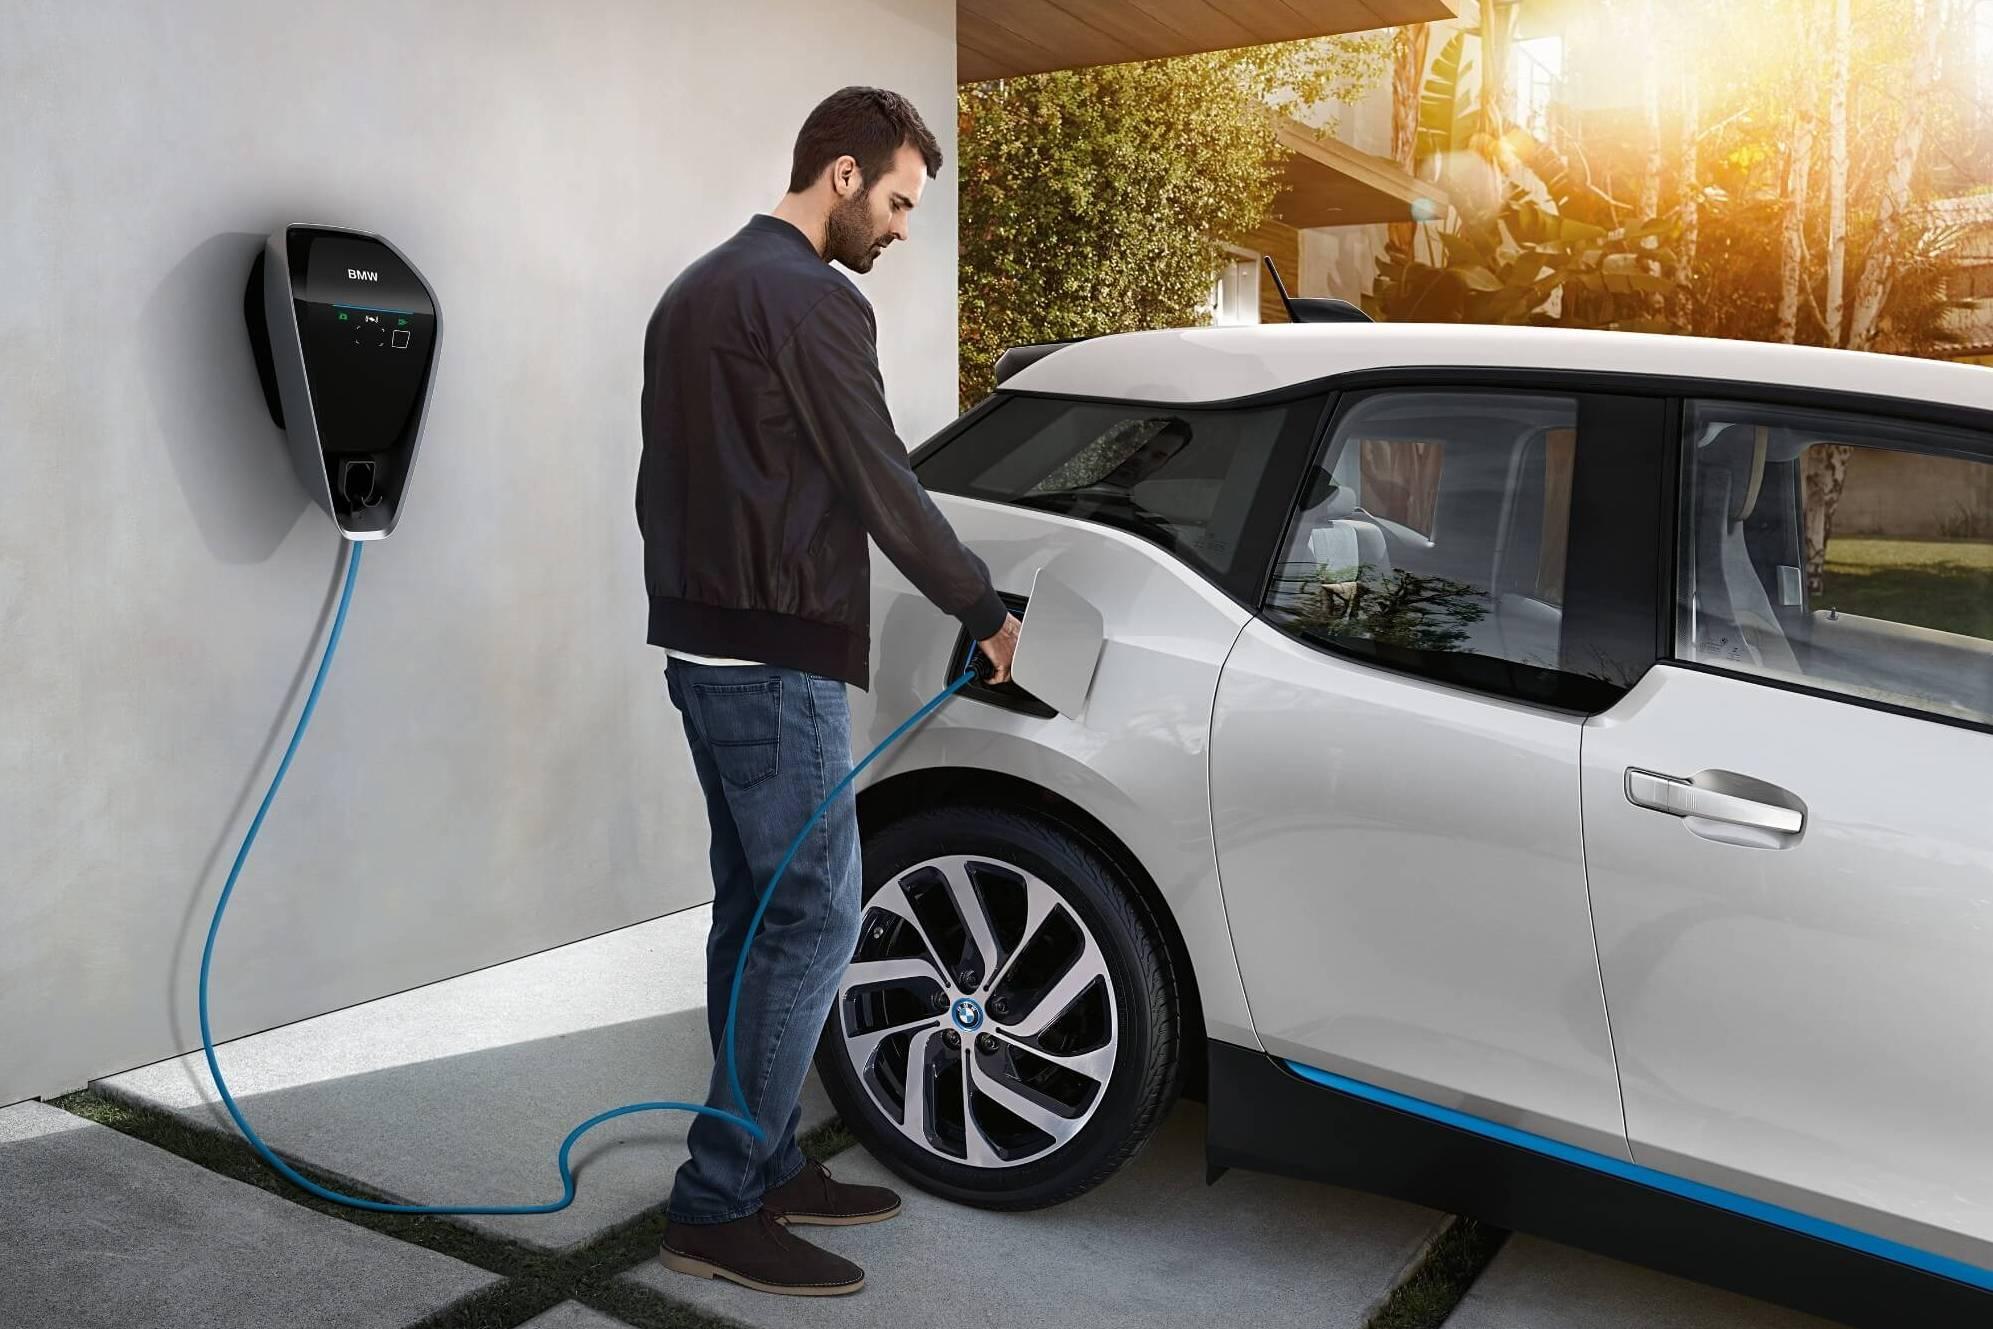 Using the BMW i3 REx gas engine